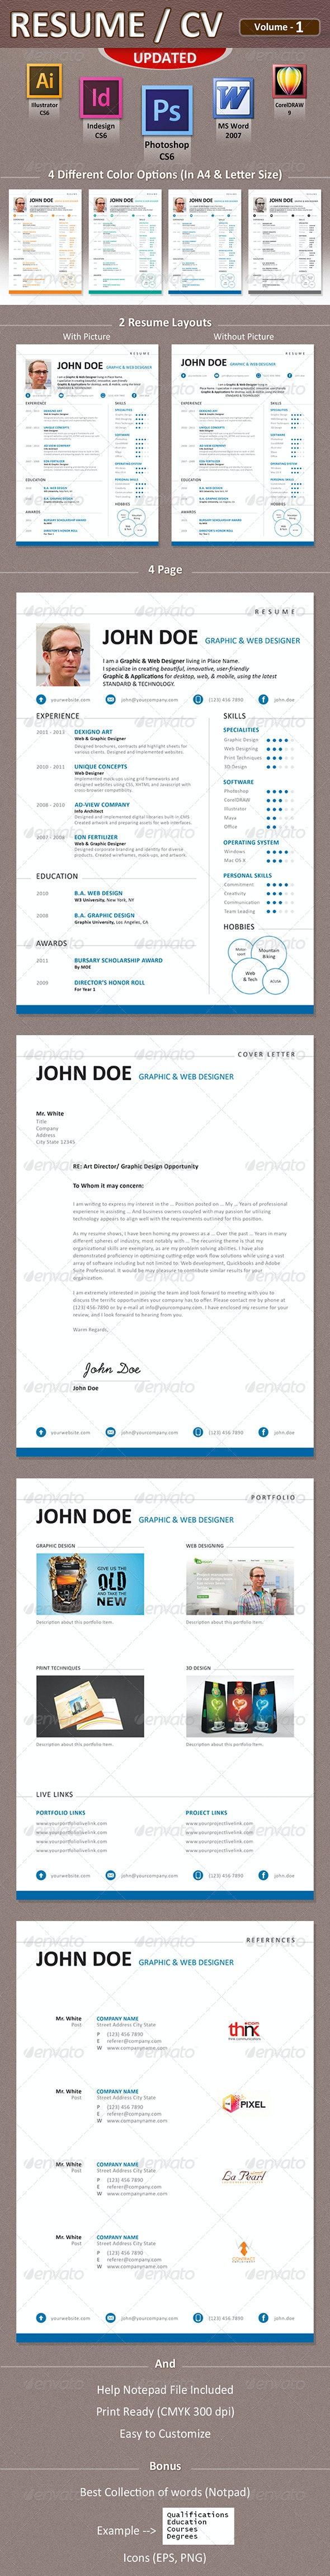 Resume / CV / Curriculum Vitae - Print Templates